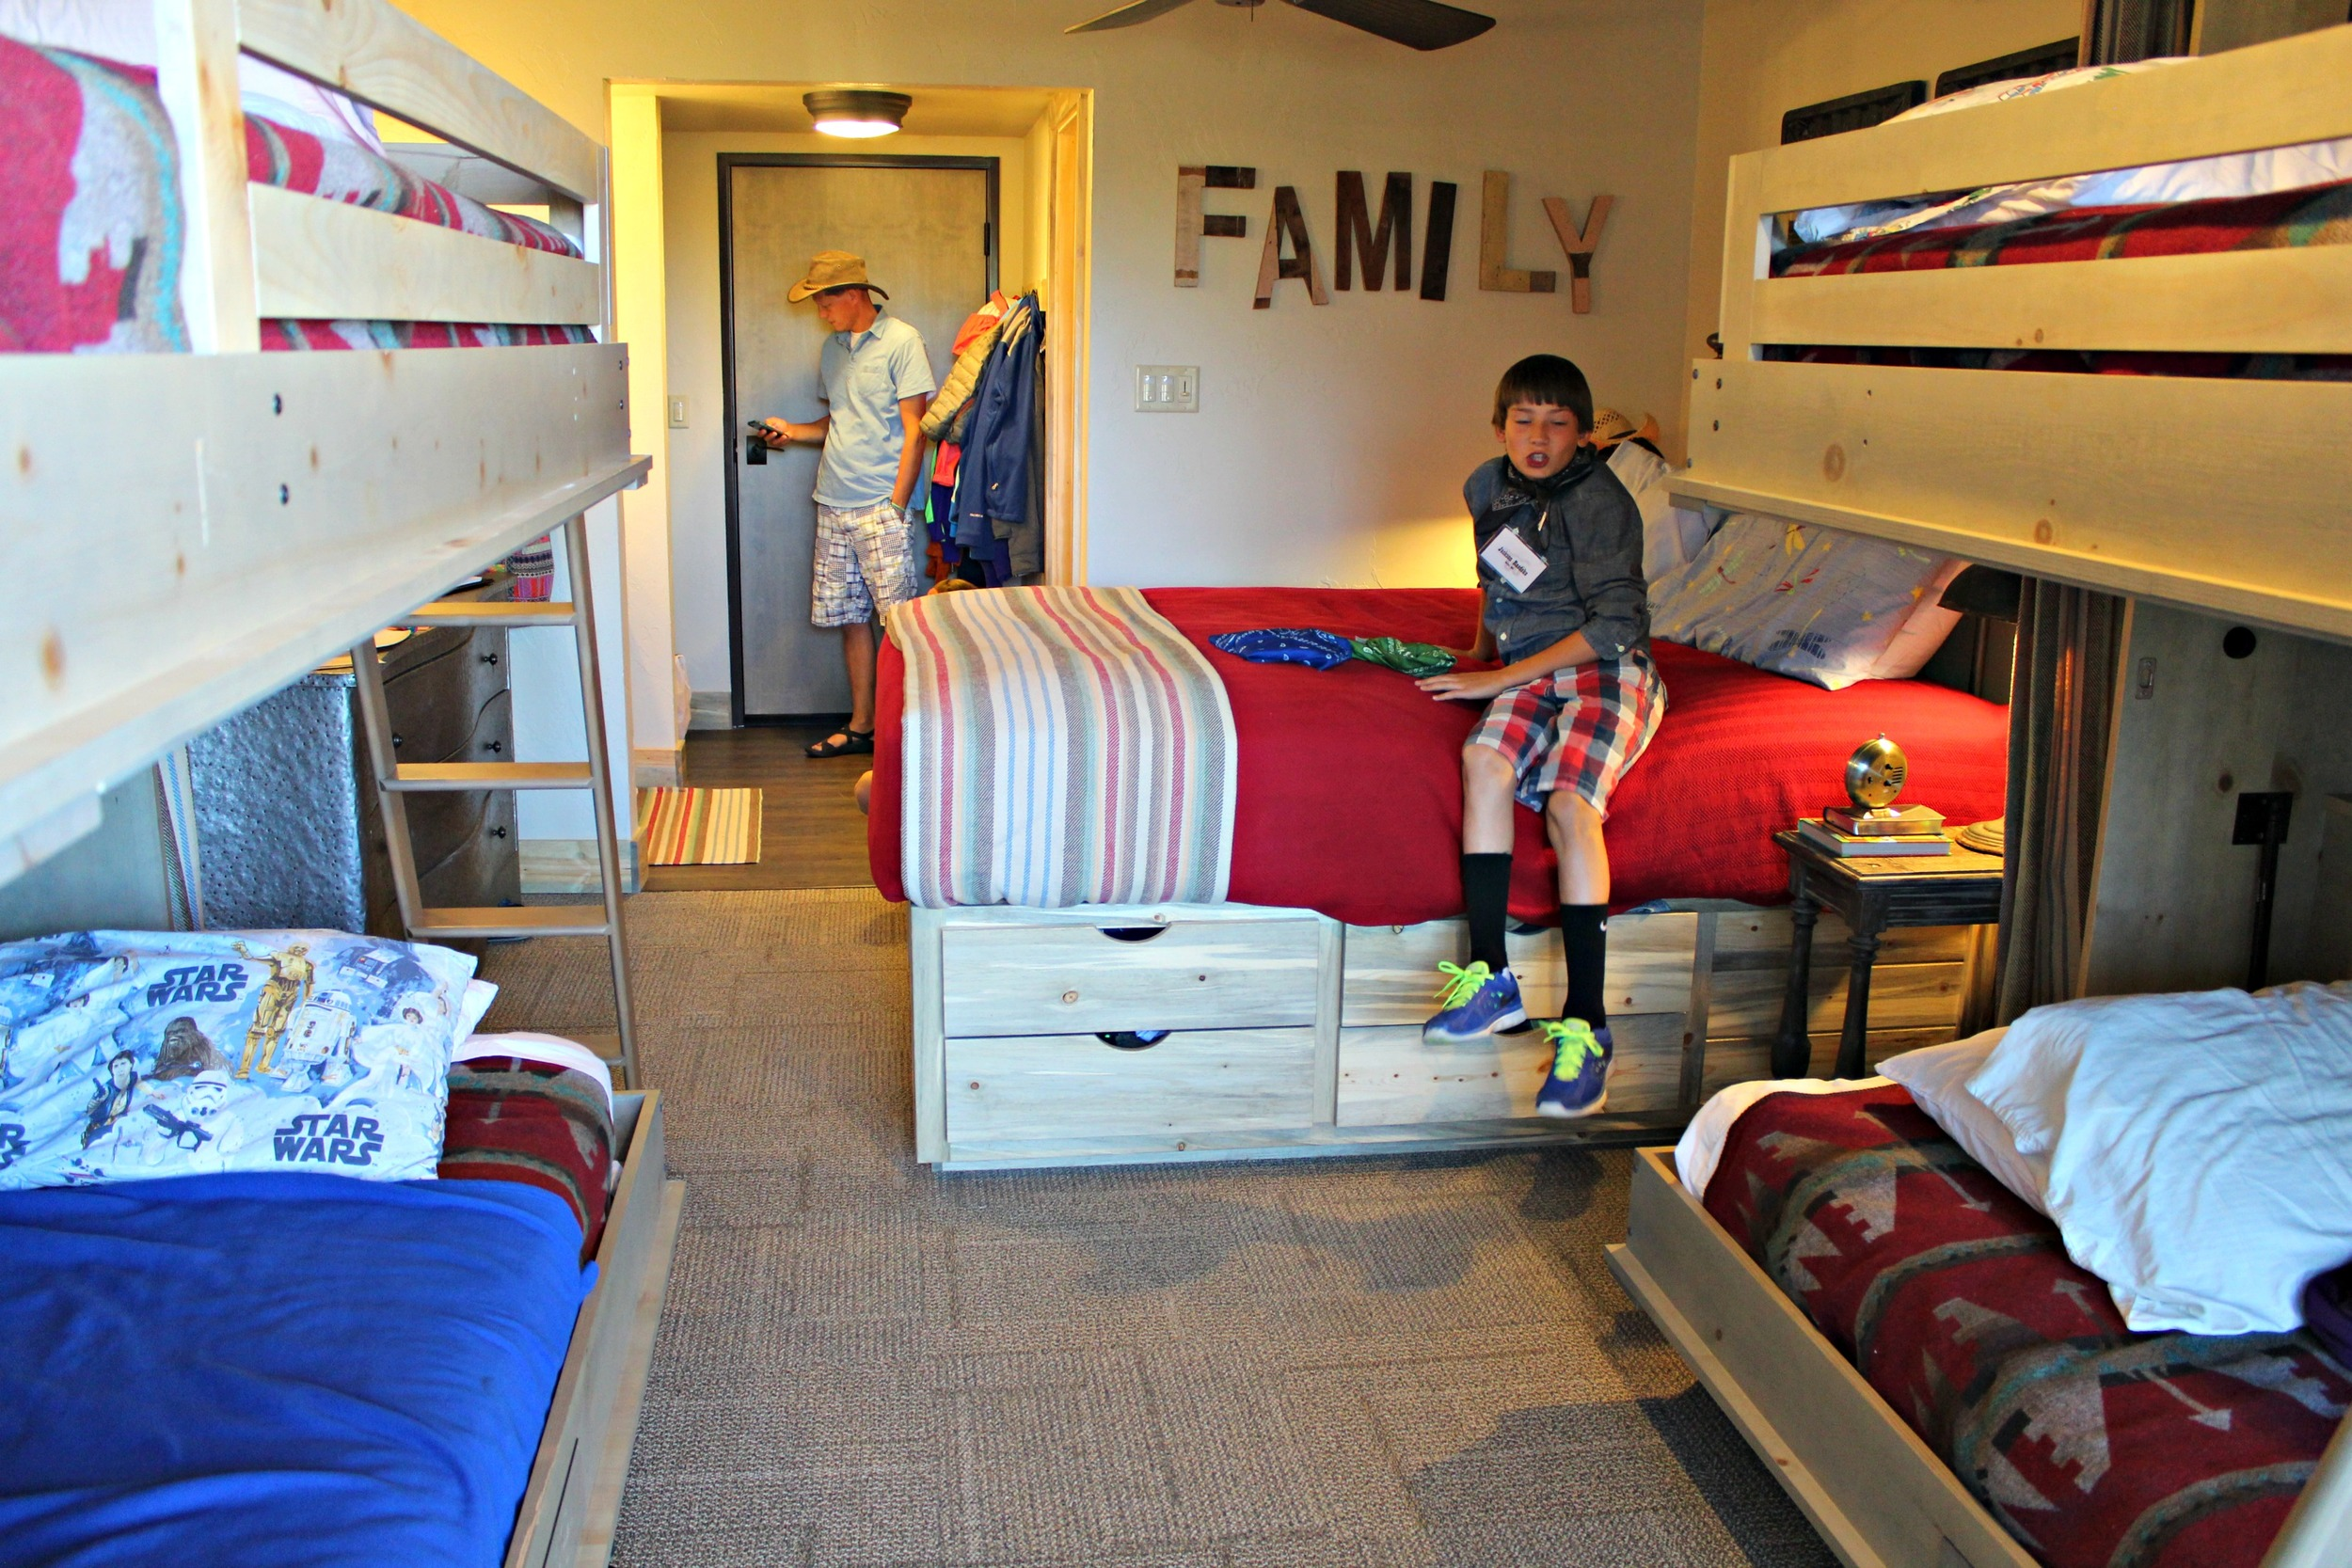 murphy-bunk-beds